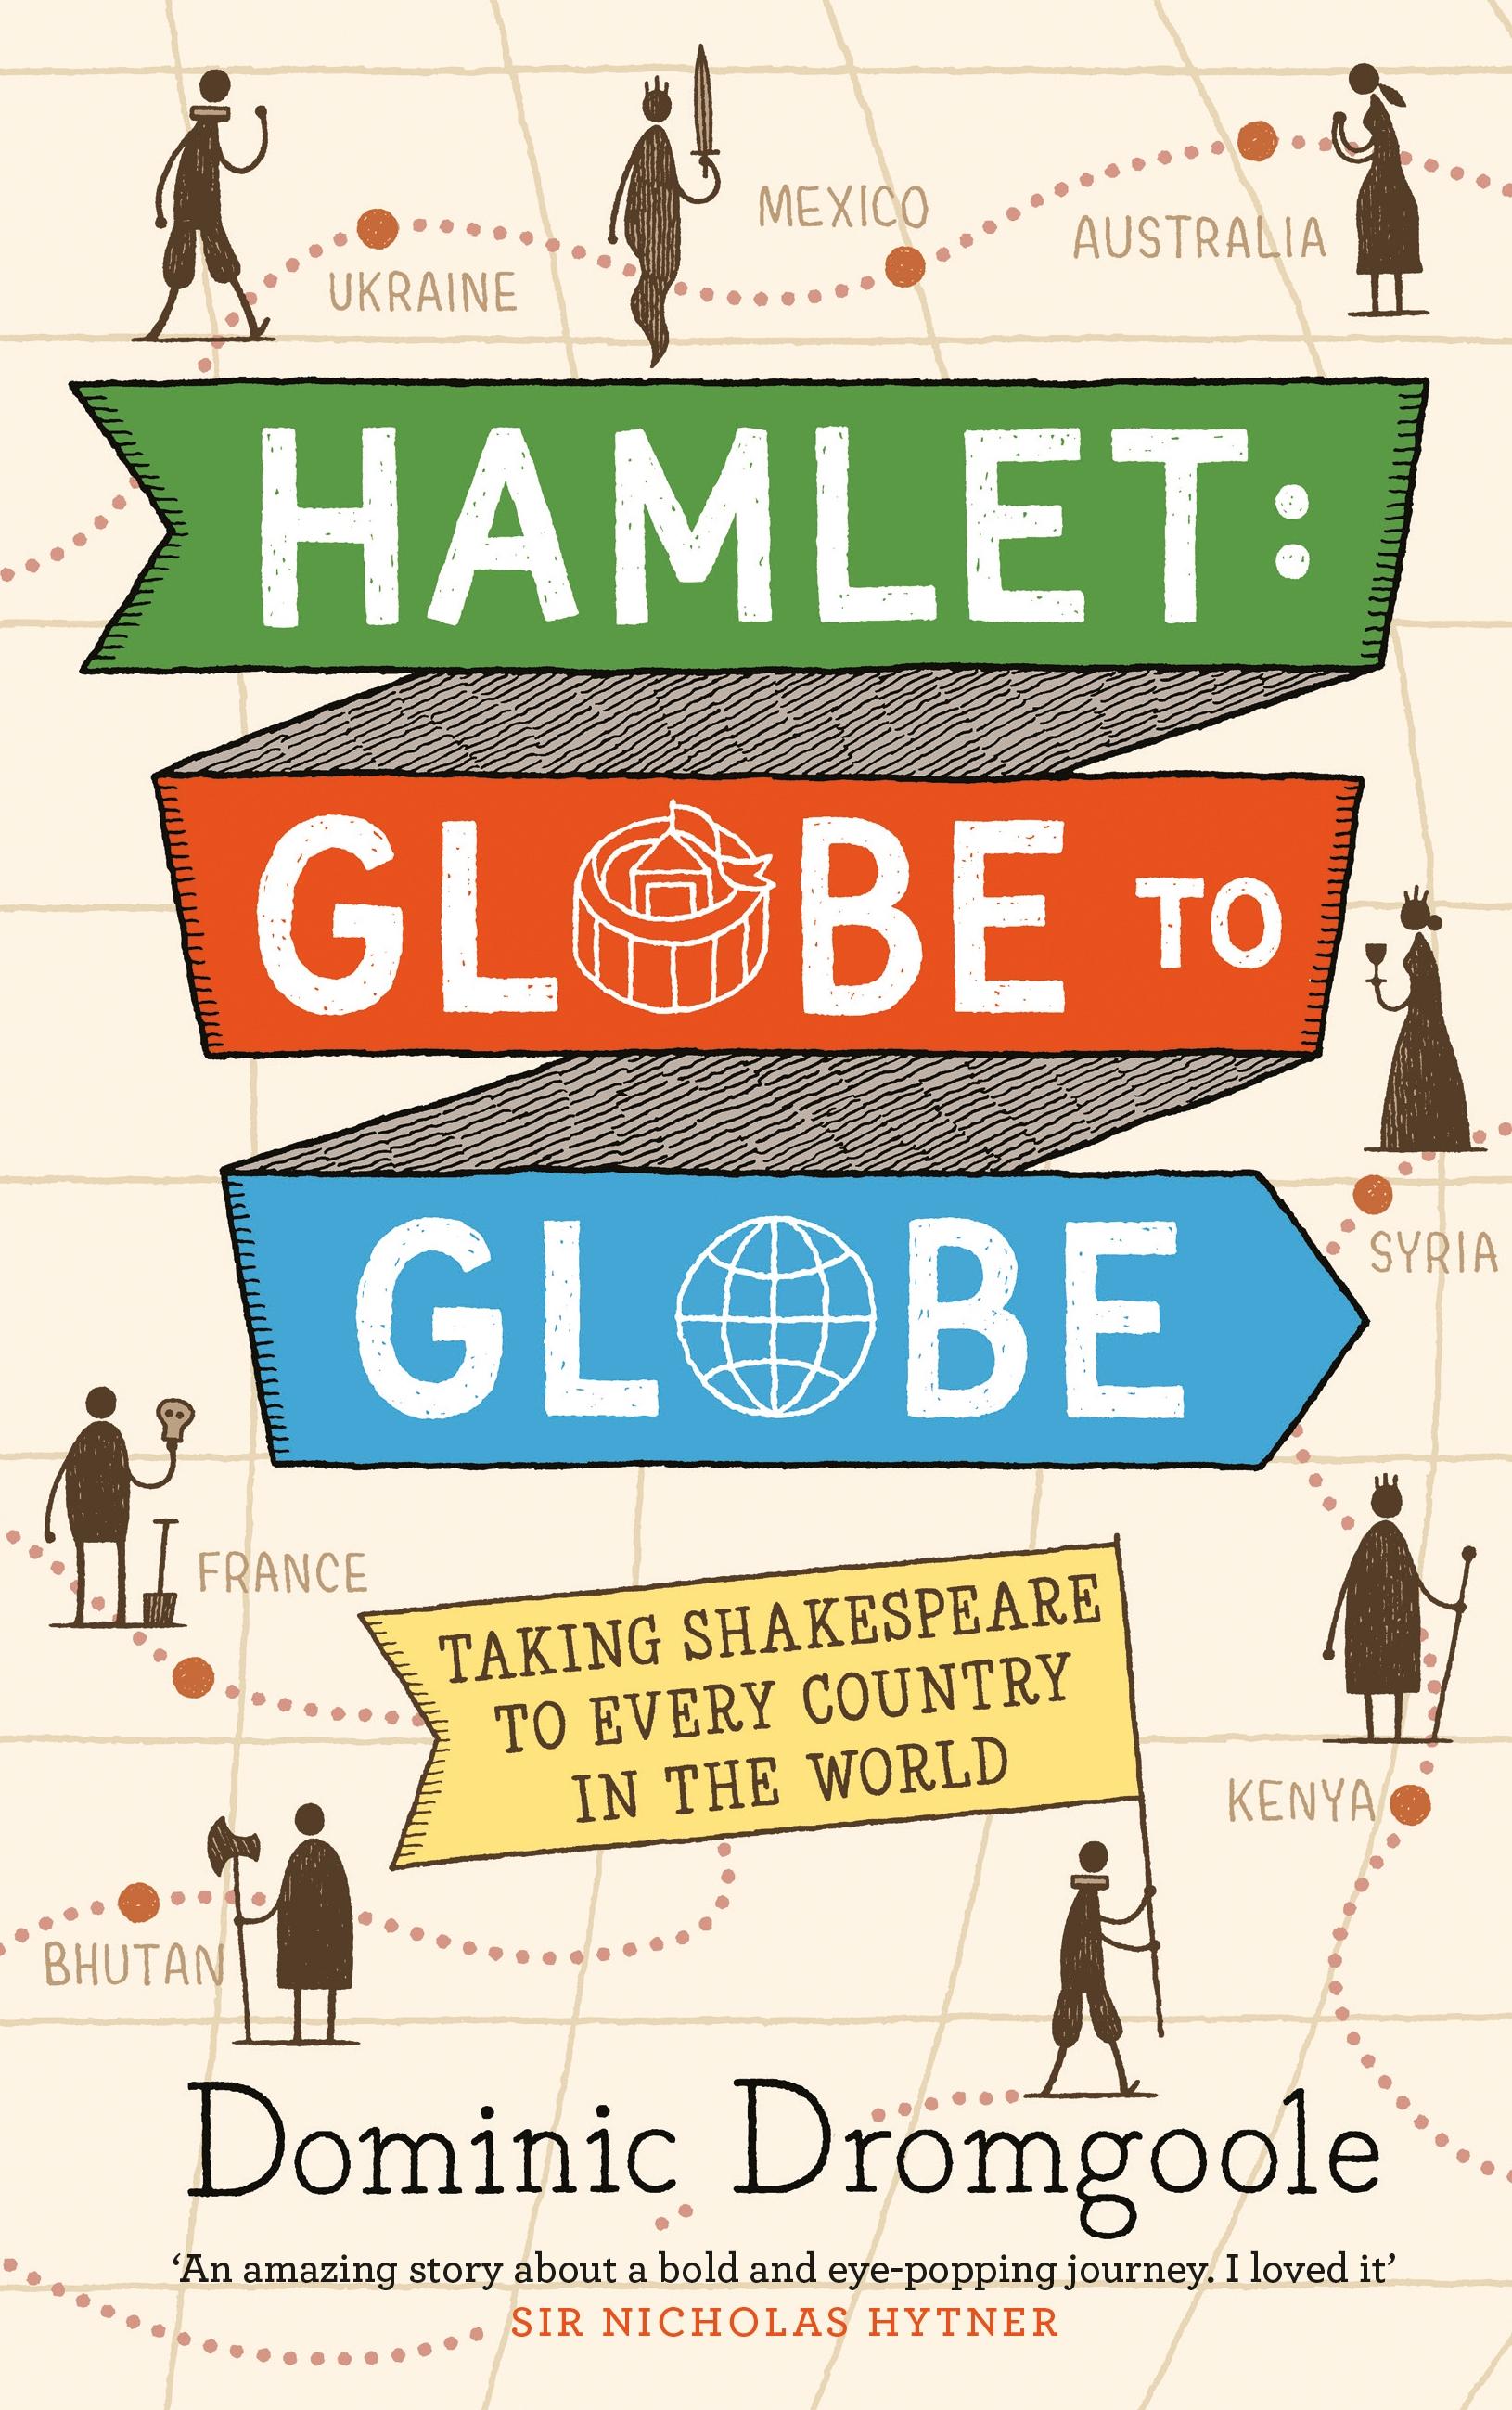 Taking Hamlet World Wide